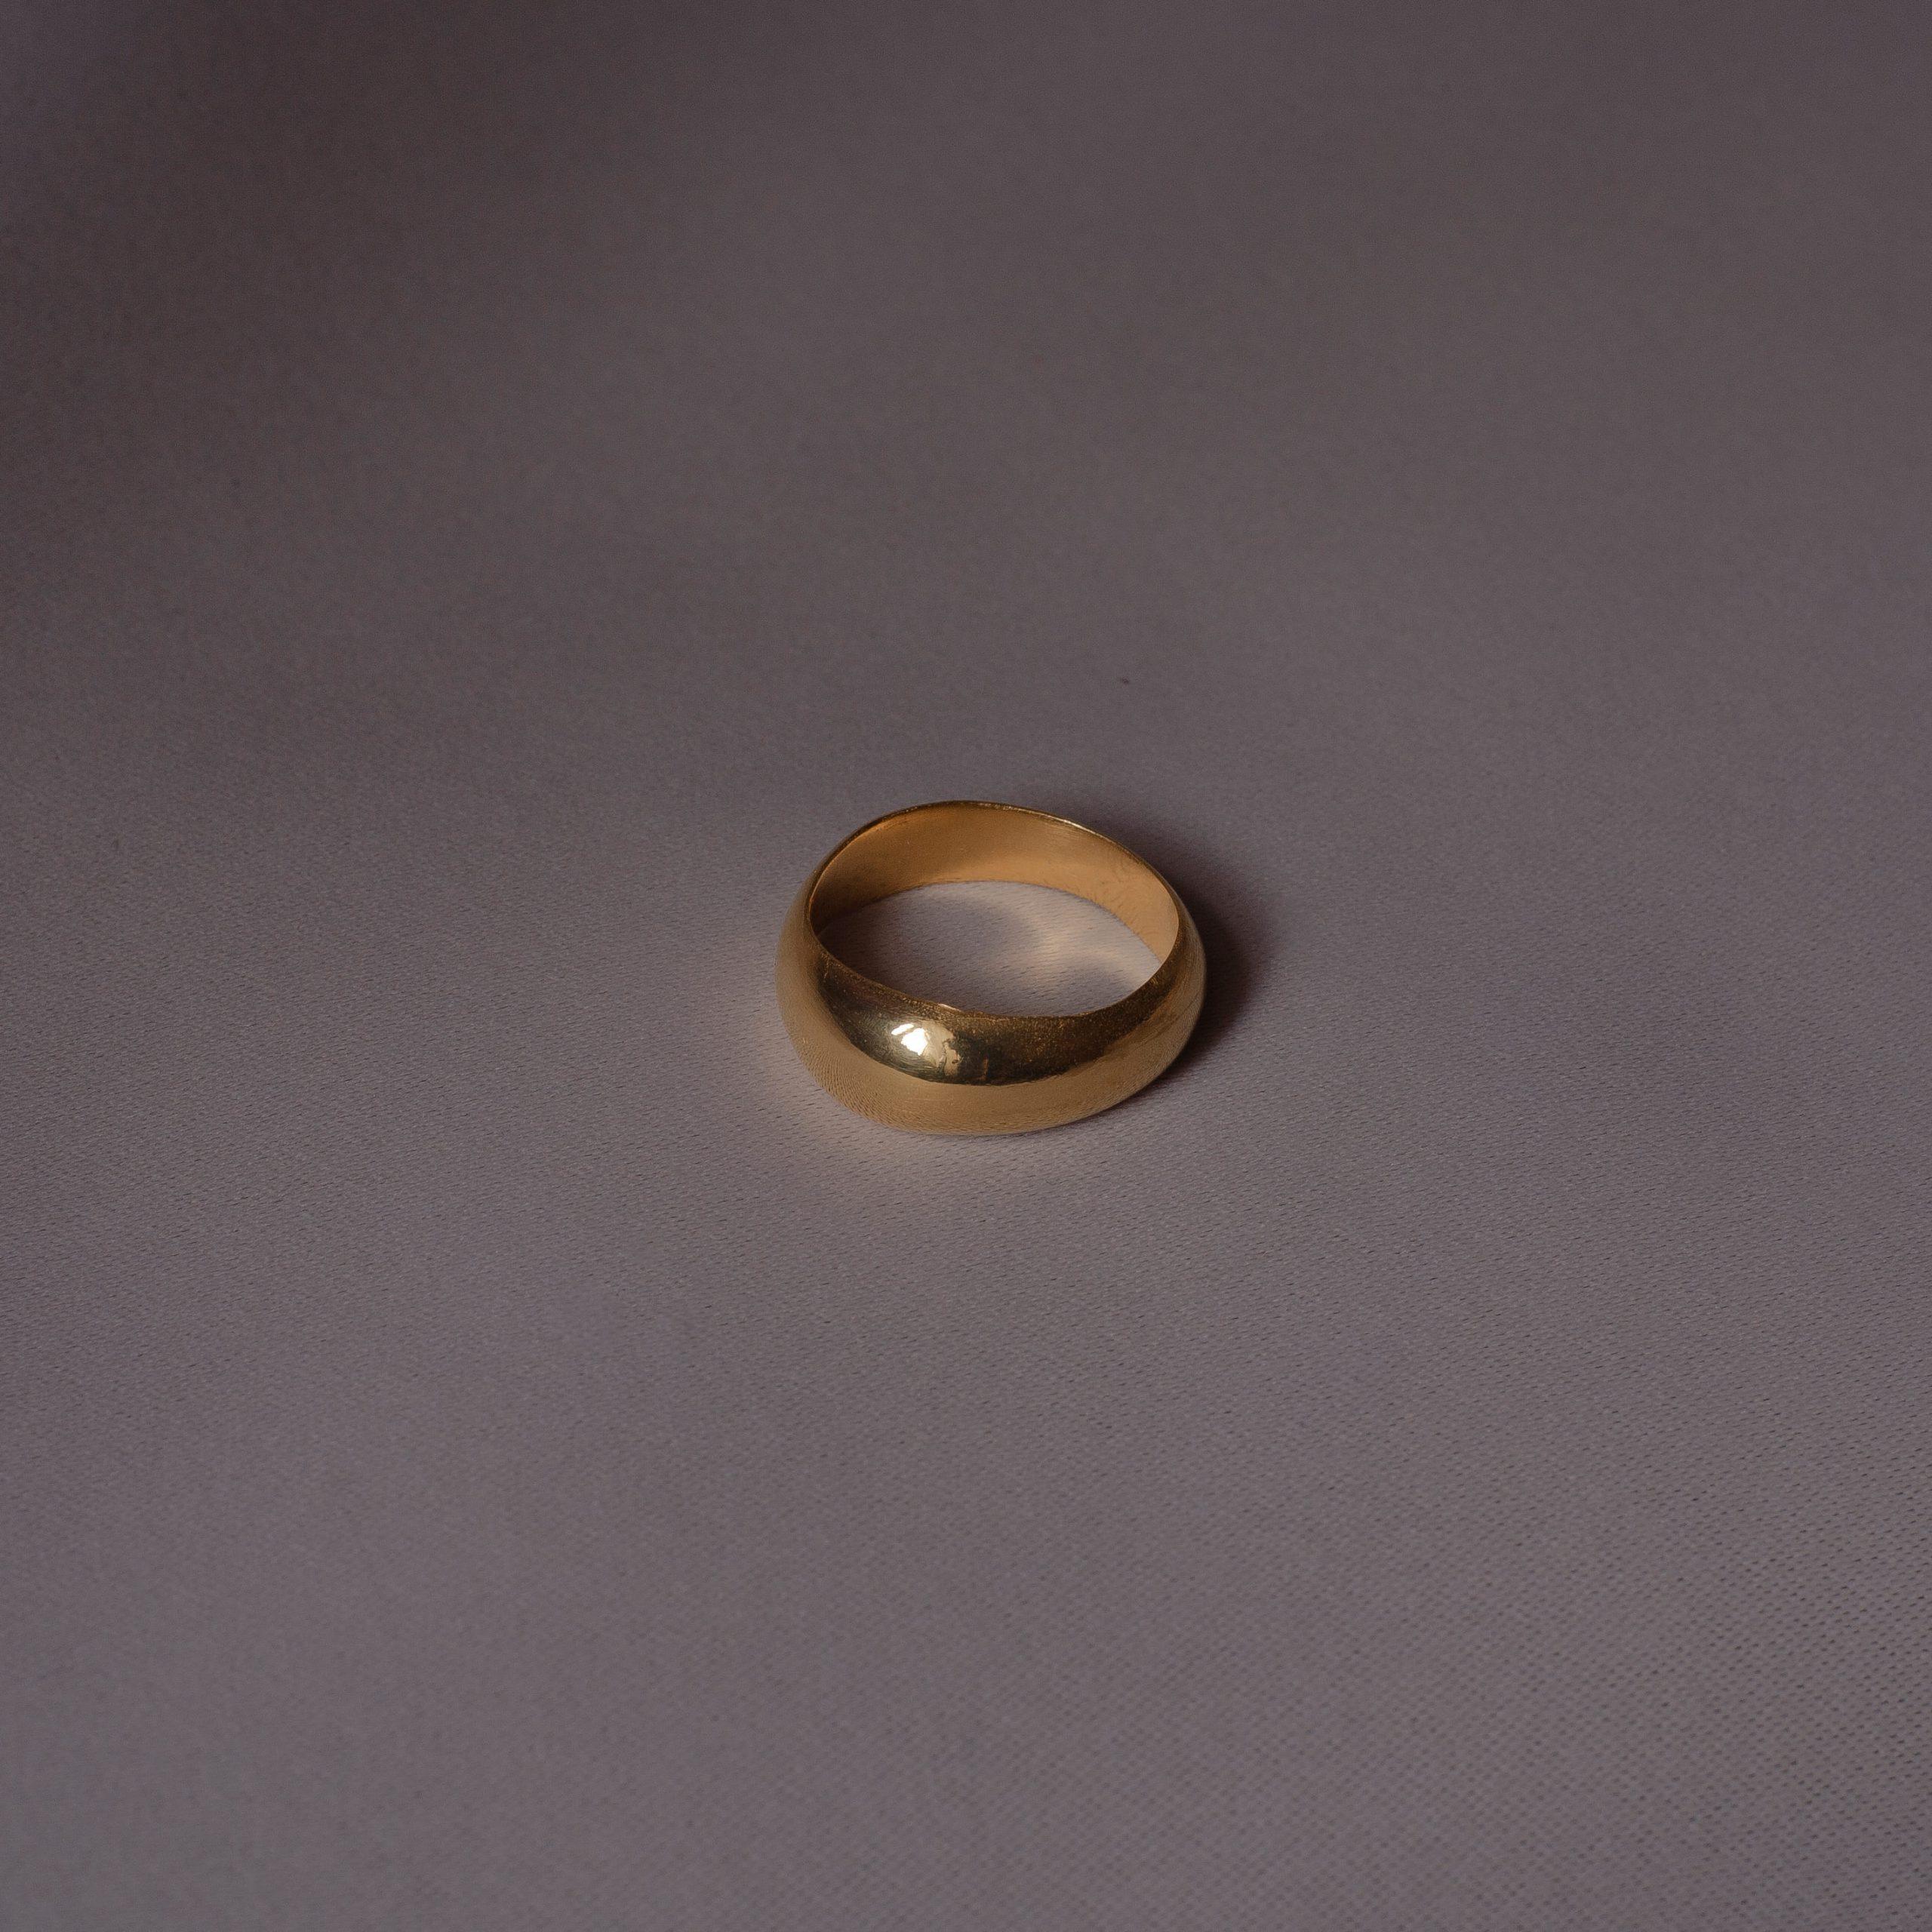 shirokoe-zolotoe-kolco-r20-gold